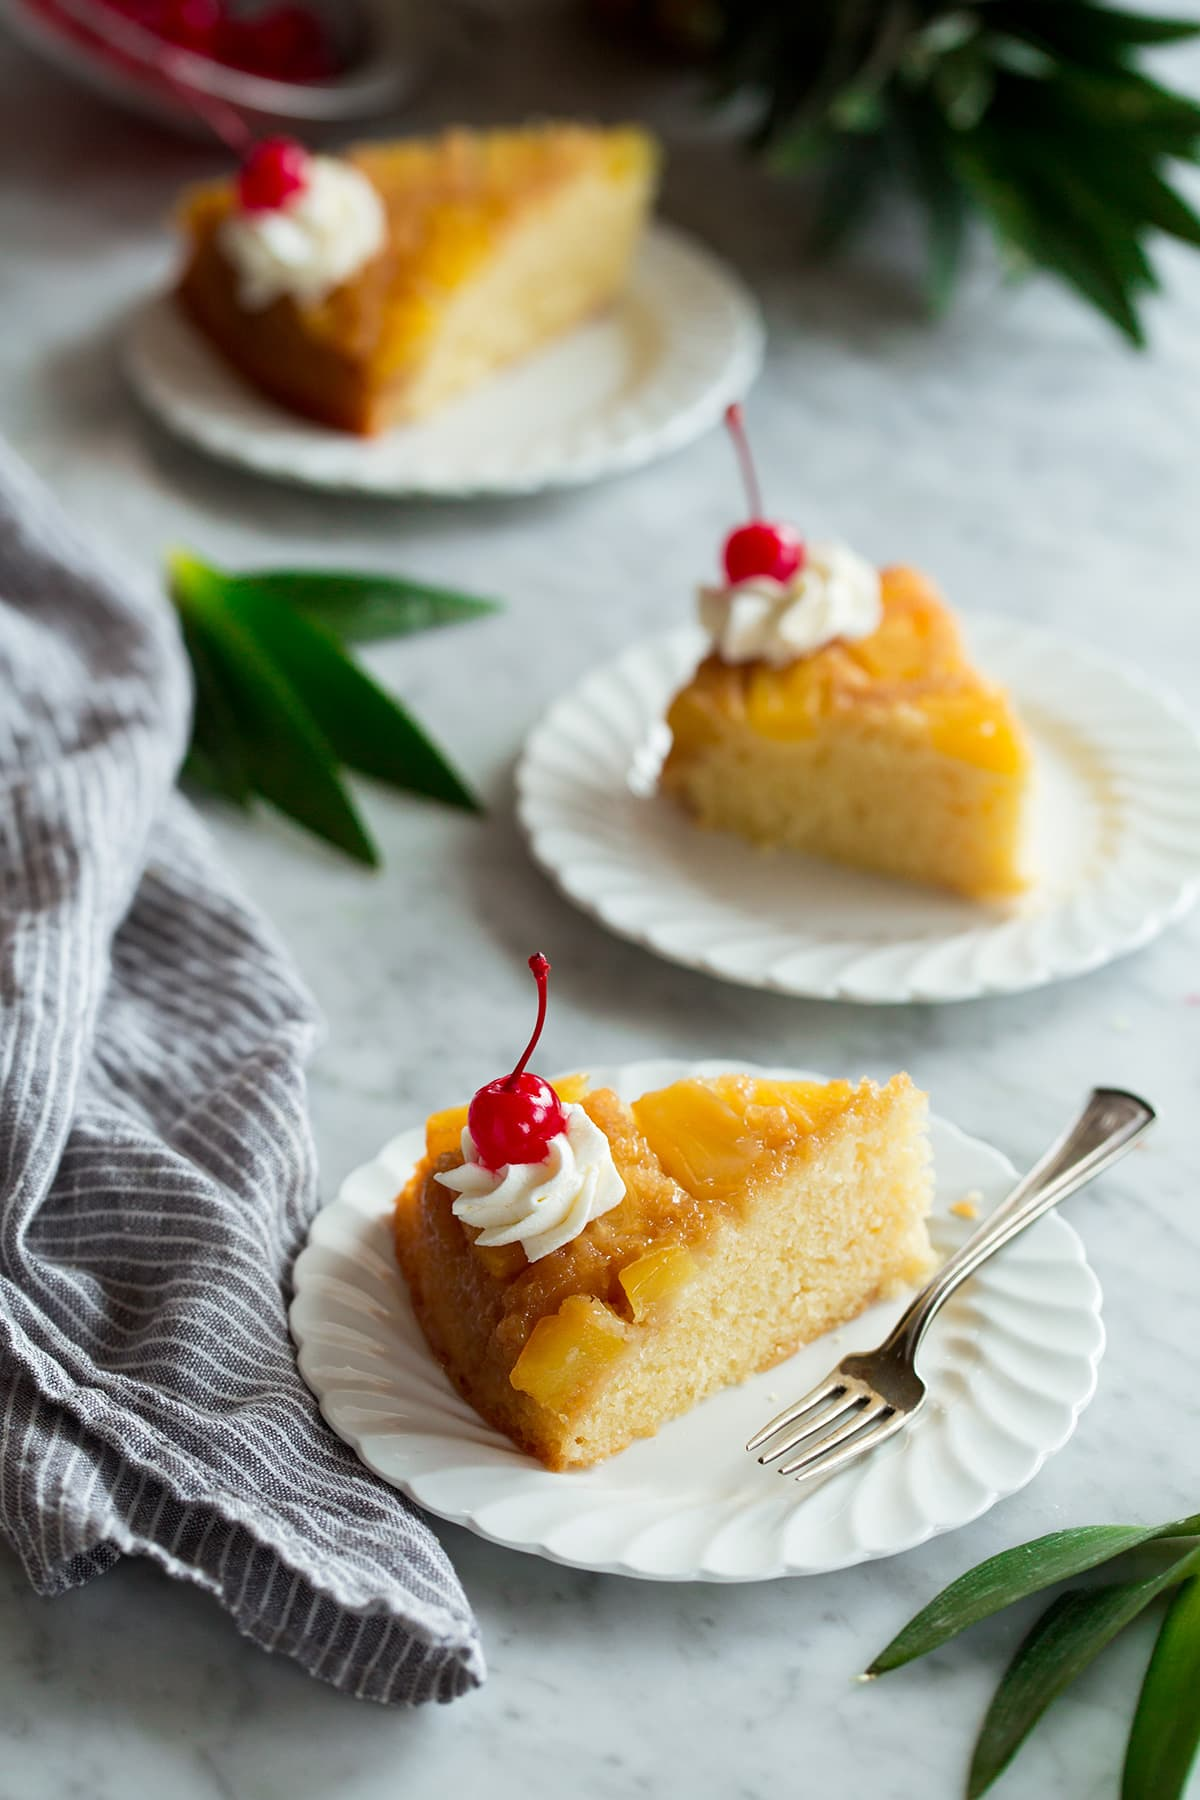 Three slices of Pineapple Upside Down Cake on individual white ruffled dessert plates.